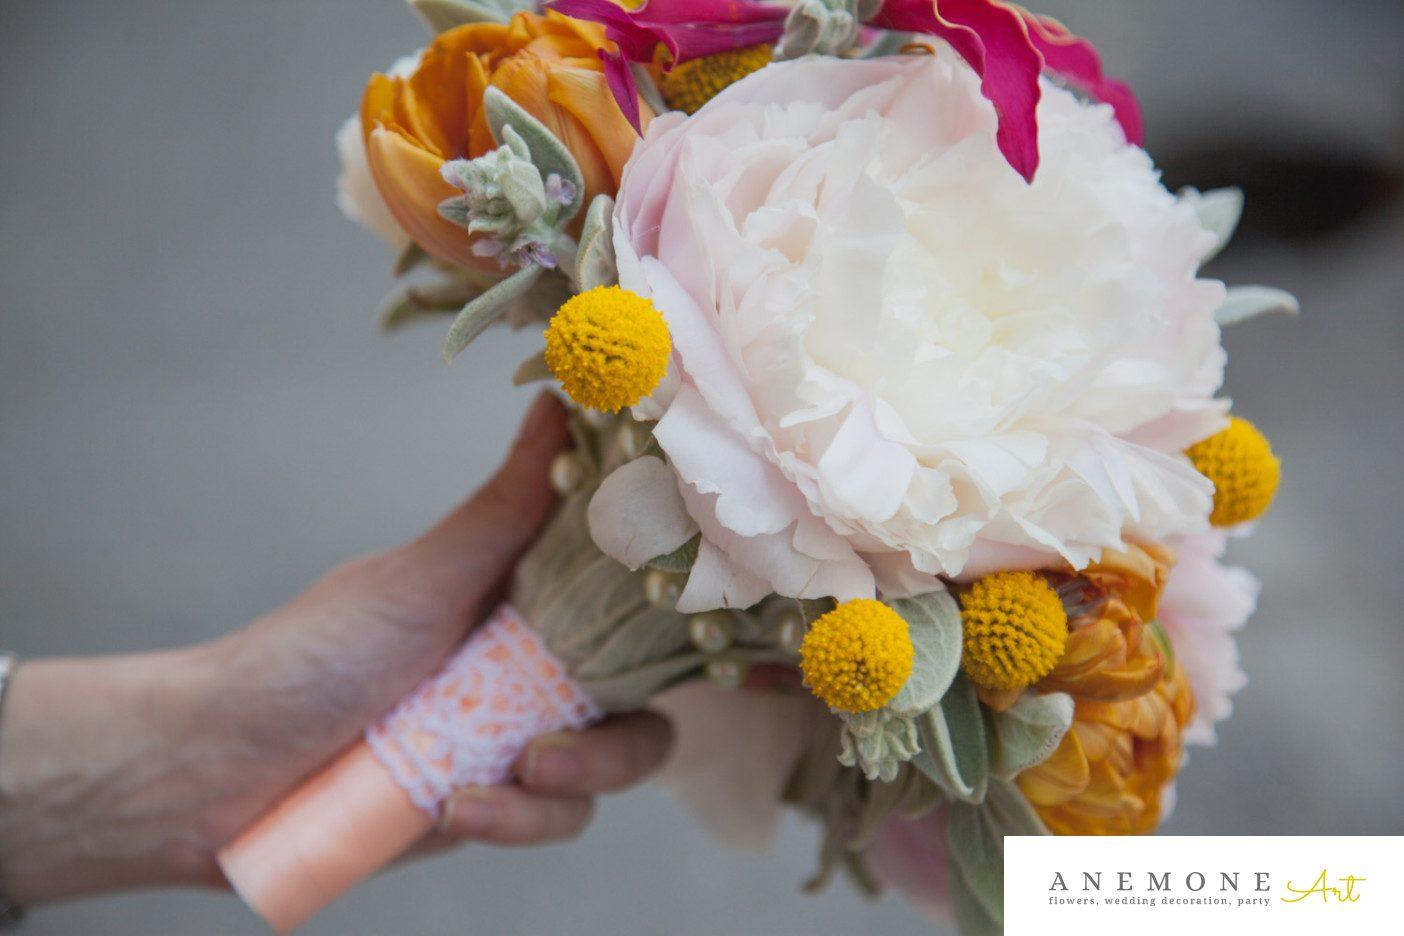 Poza, foto cu Flori de nunta buchet mireasa, bujori, lalele, maner buchet in Arad, Timisoara, Oradea (wedding flowers, bouquets) nunta Arad, Timisoara, Oradea